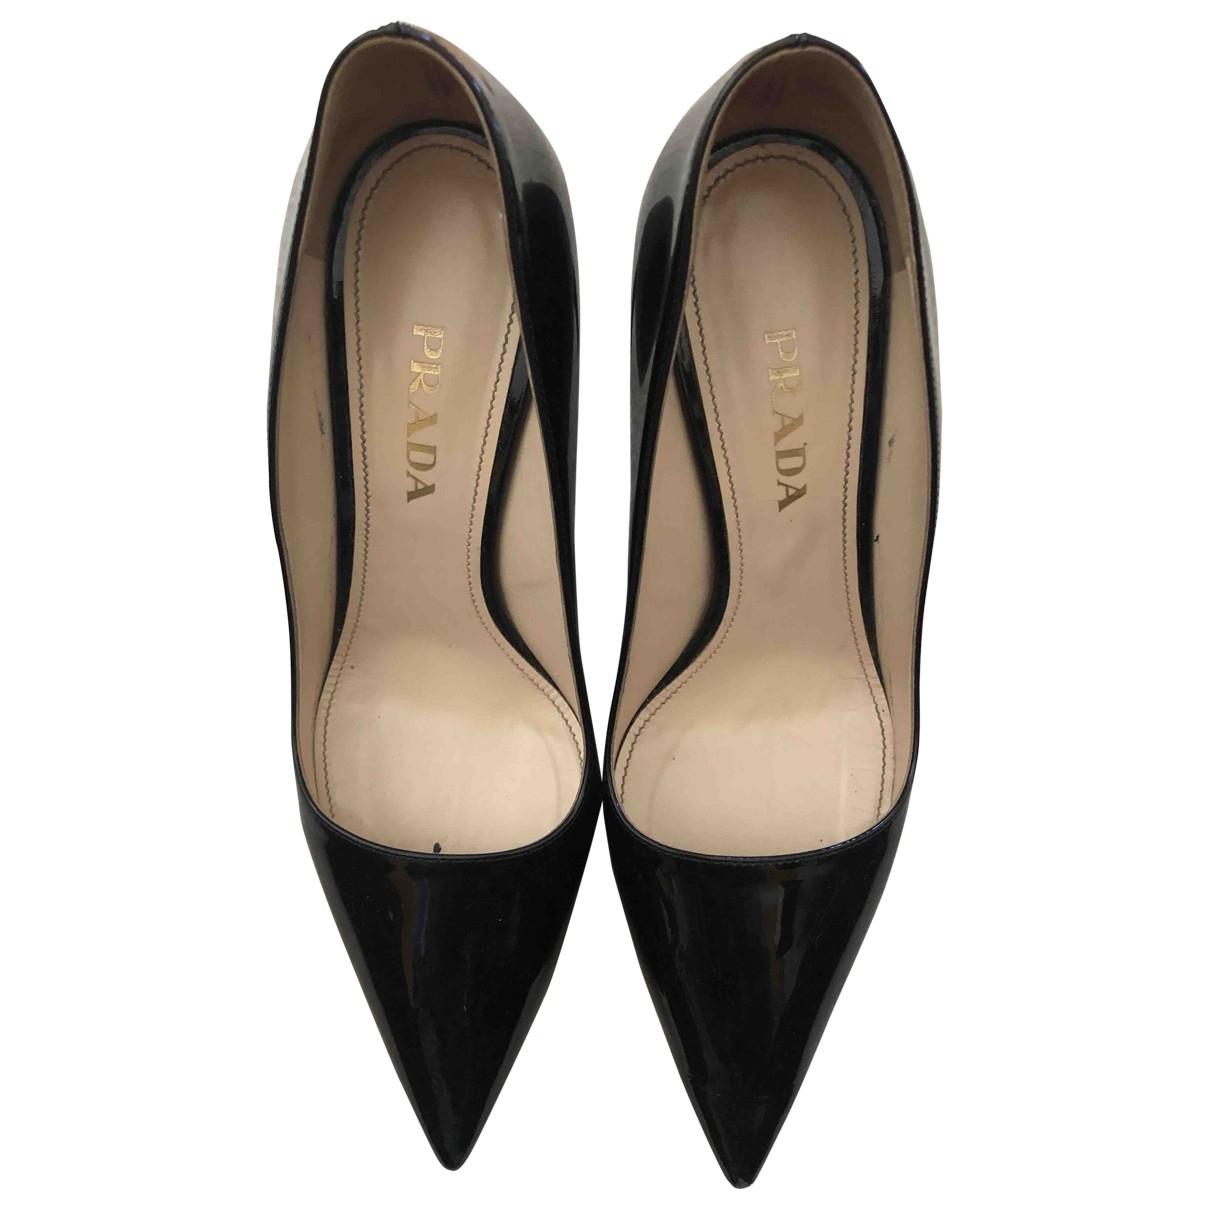 Prada \N Black Patent leather Heels for Women 38 EU